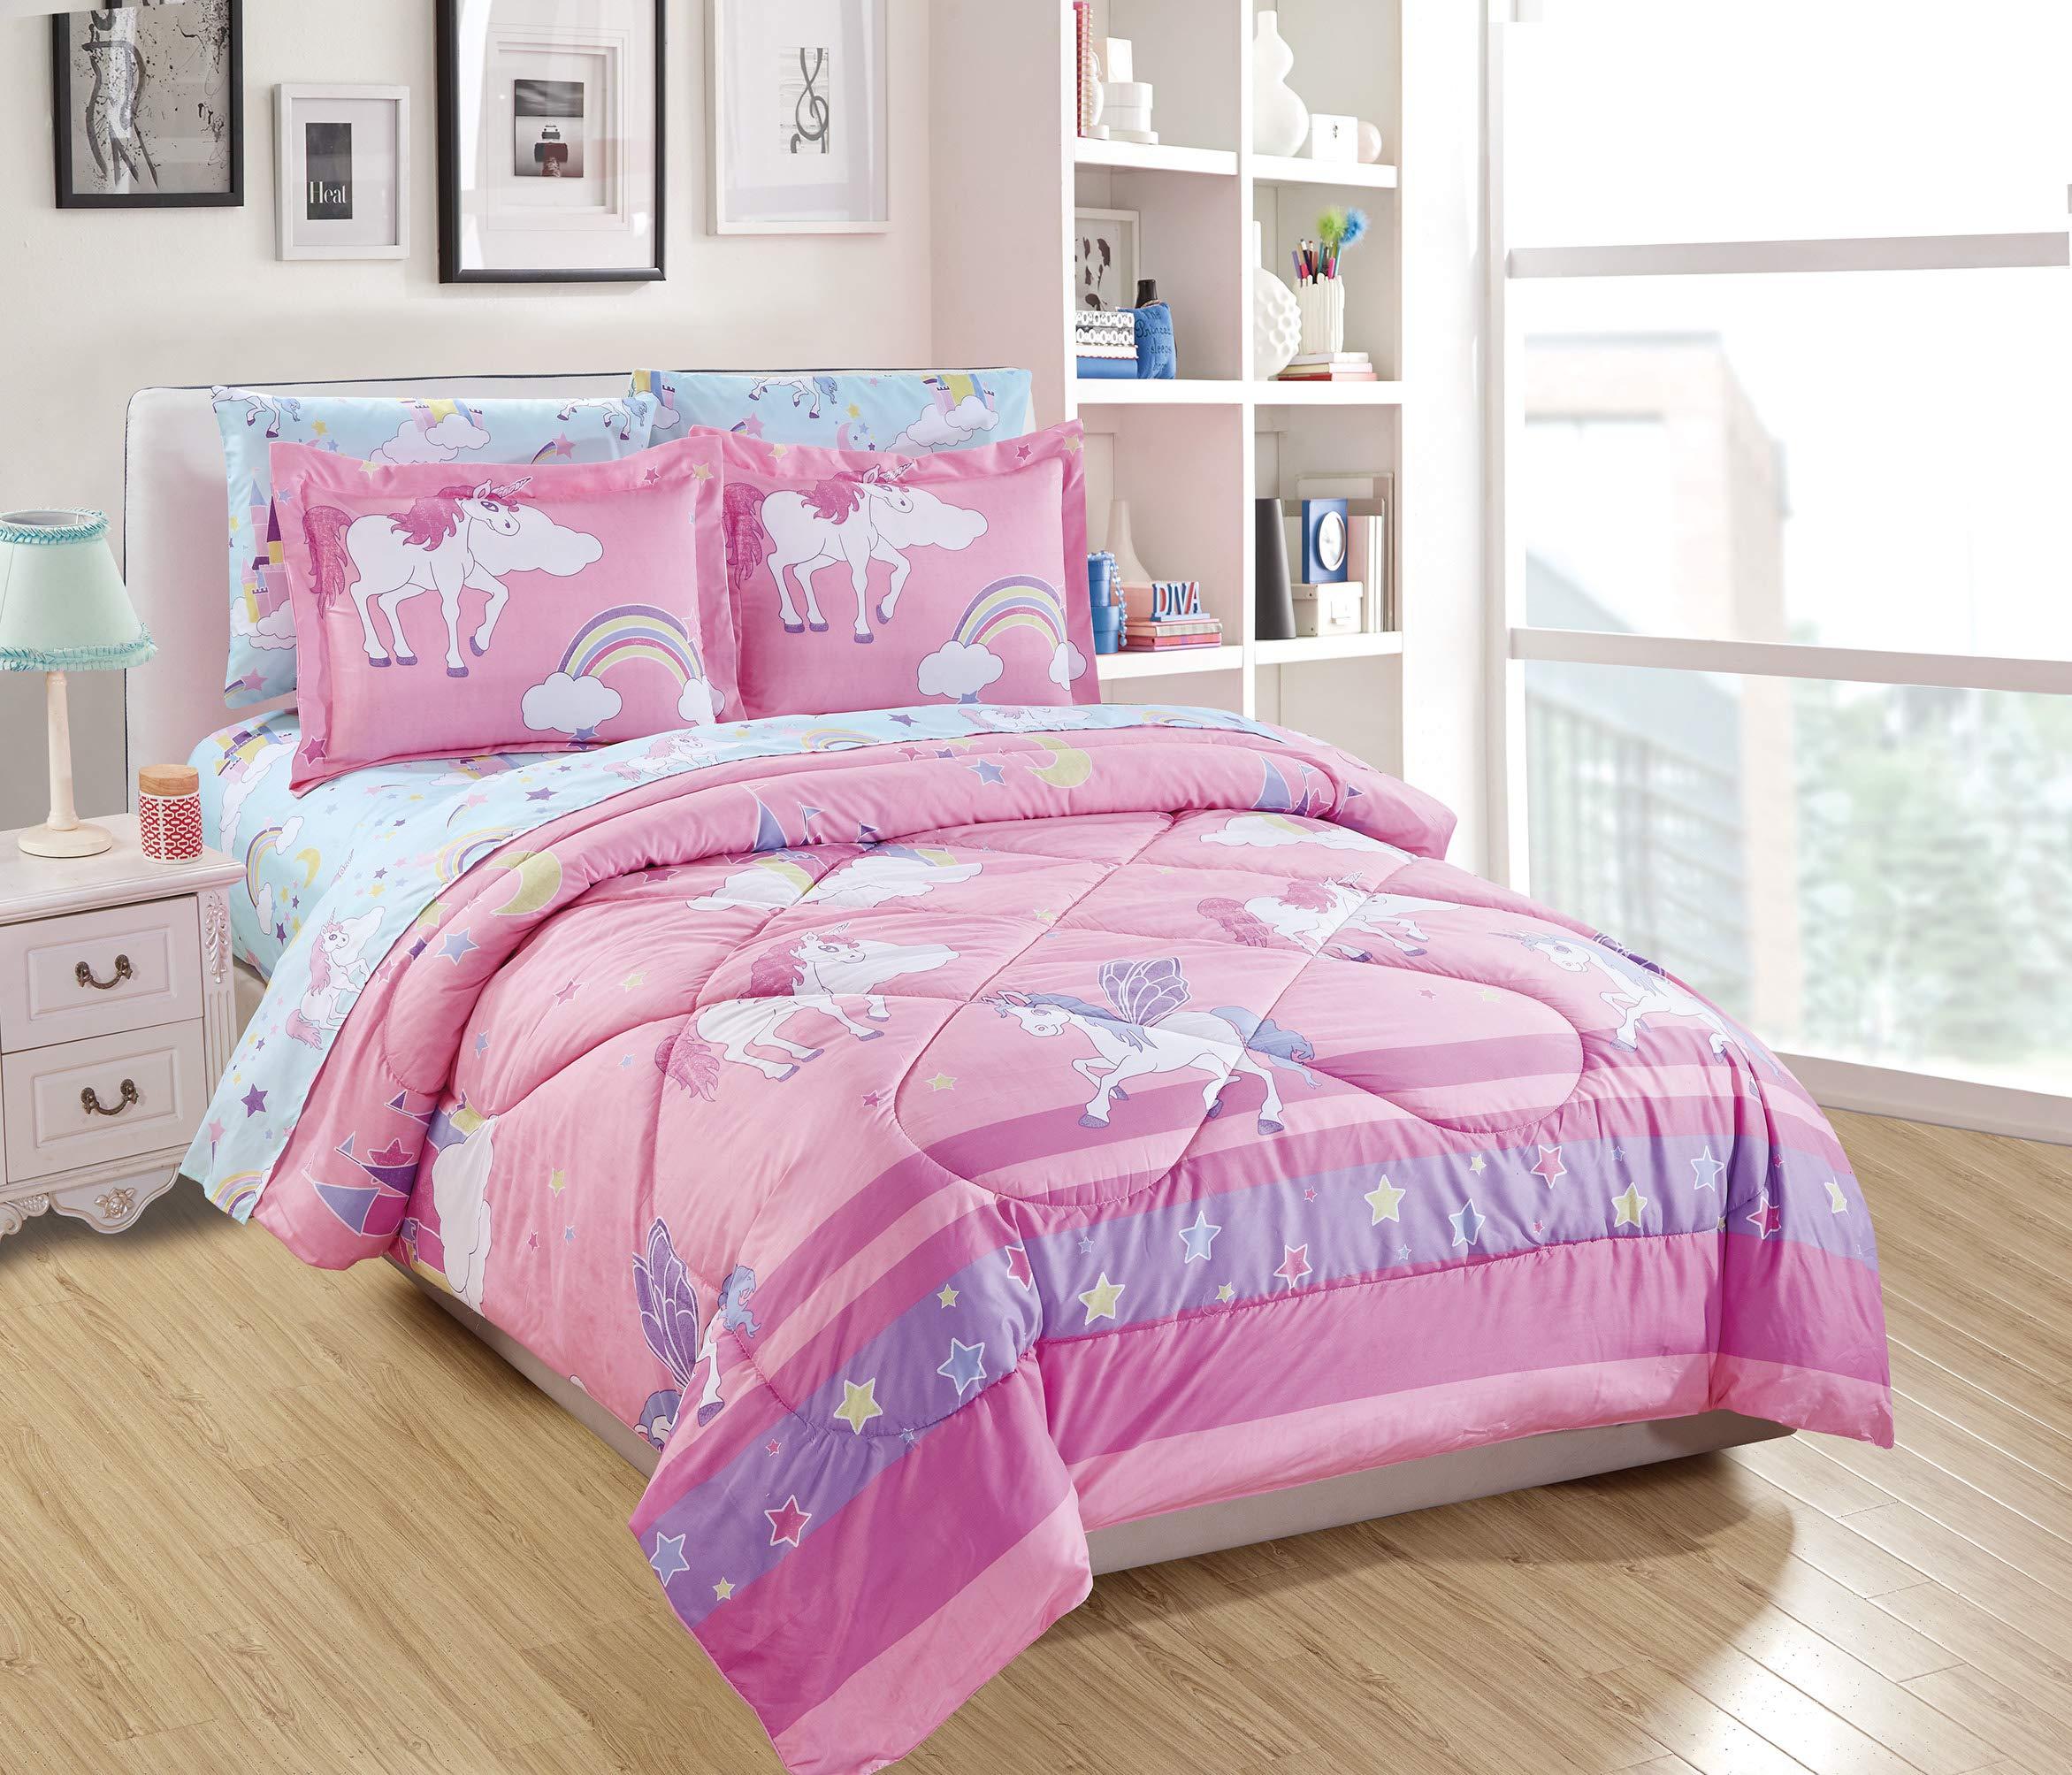 Mk Home 7pc Full Size Comforter Set for Girls Unicorn Blue Pink Purple Yellow White New